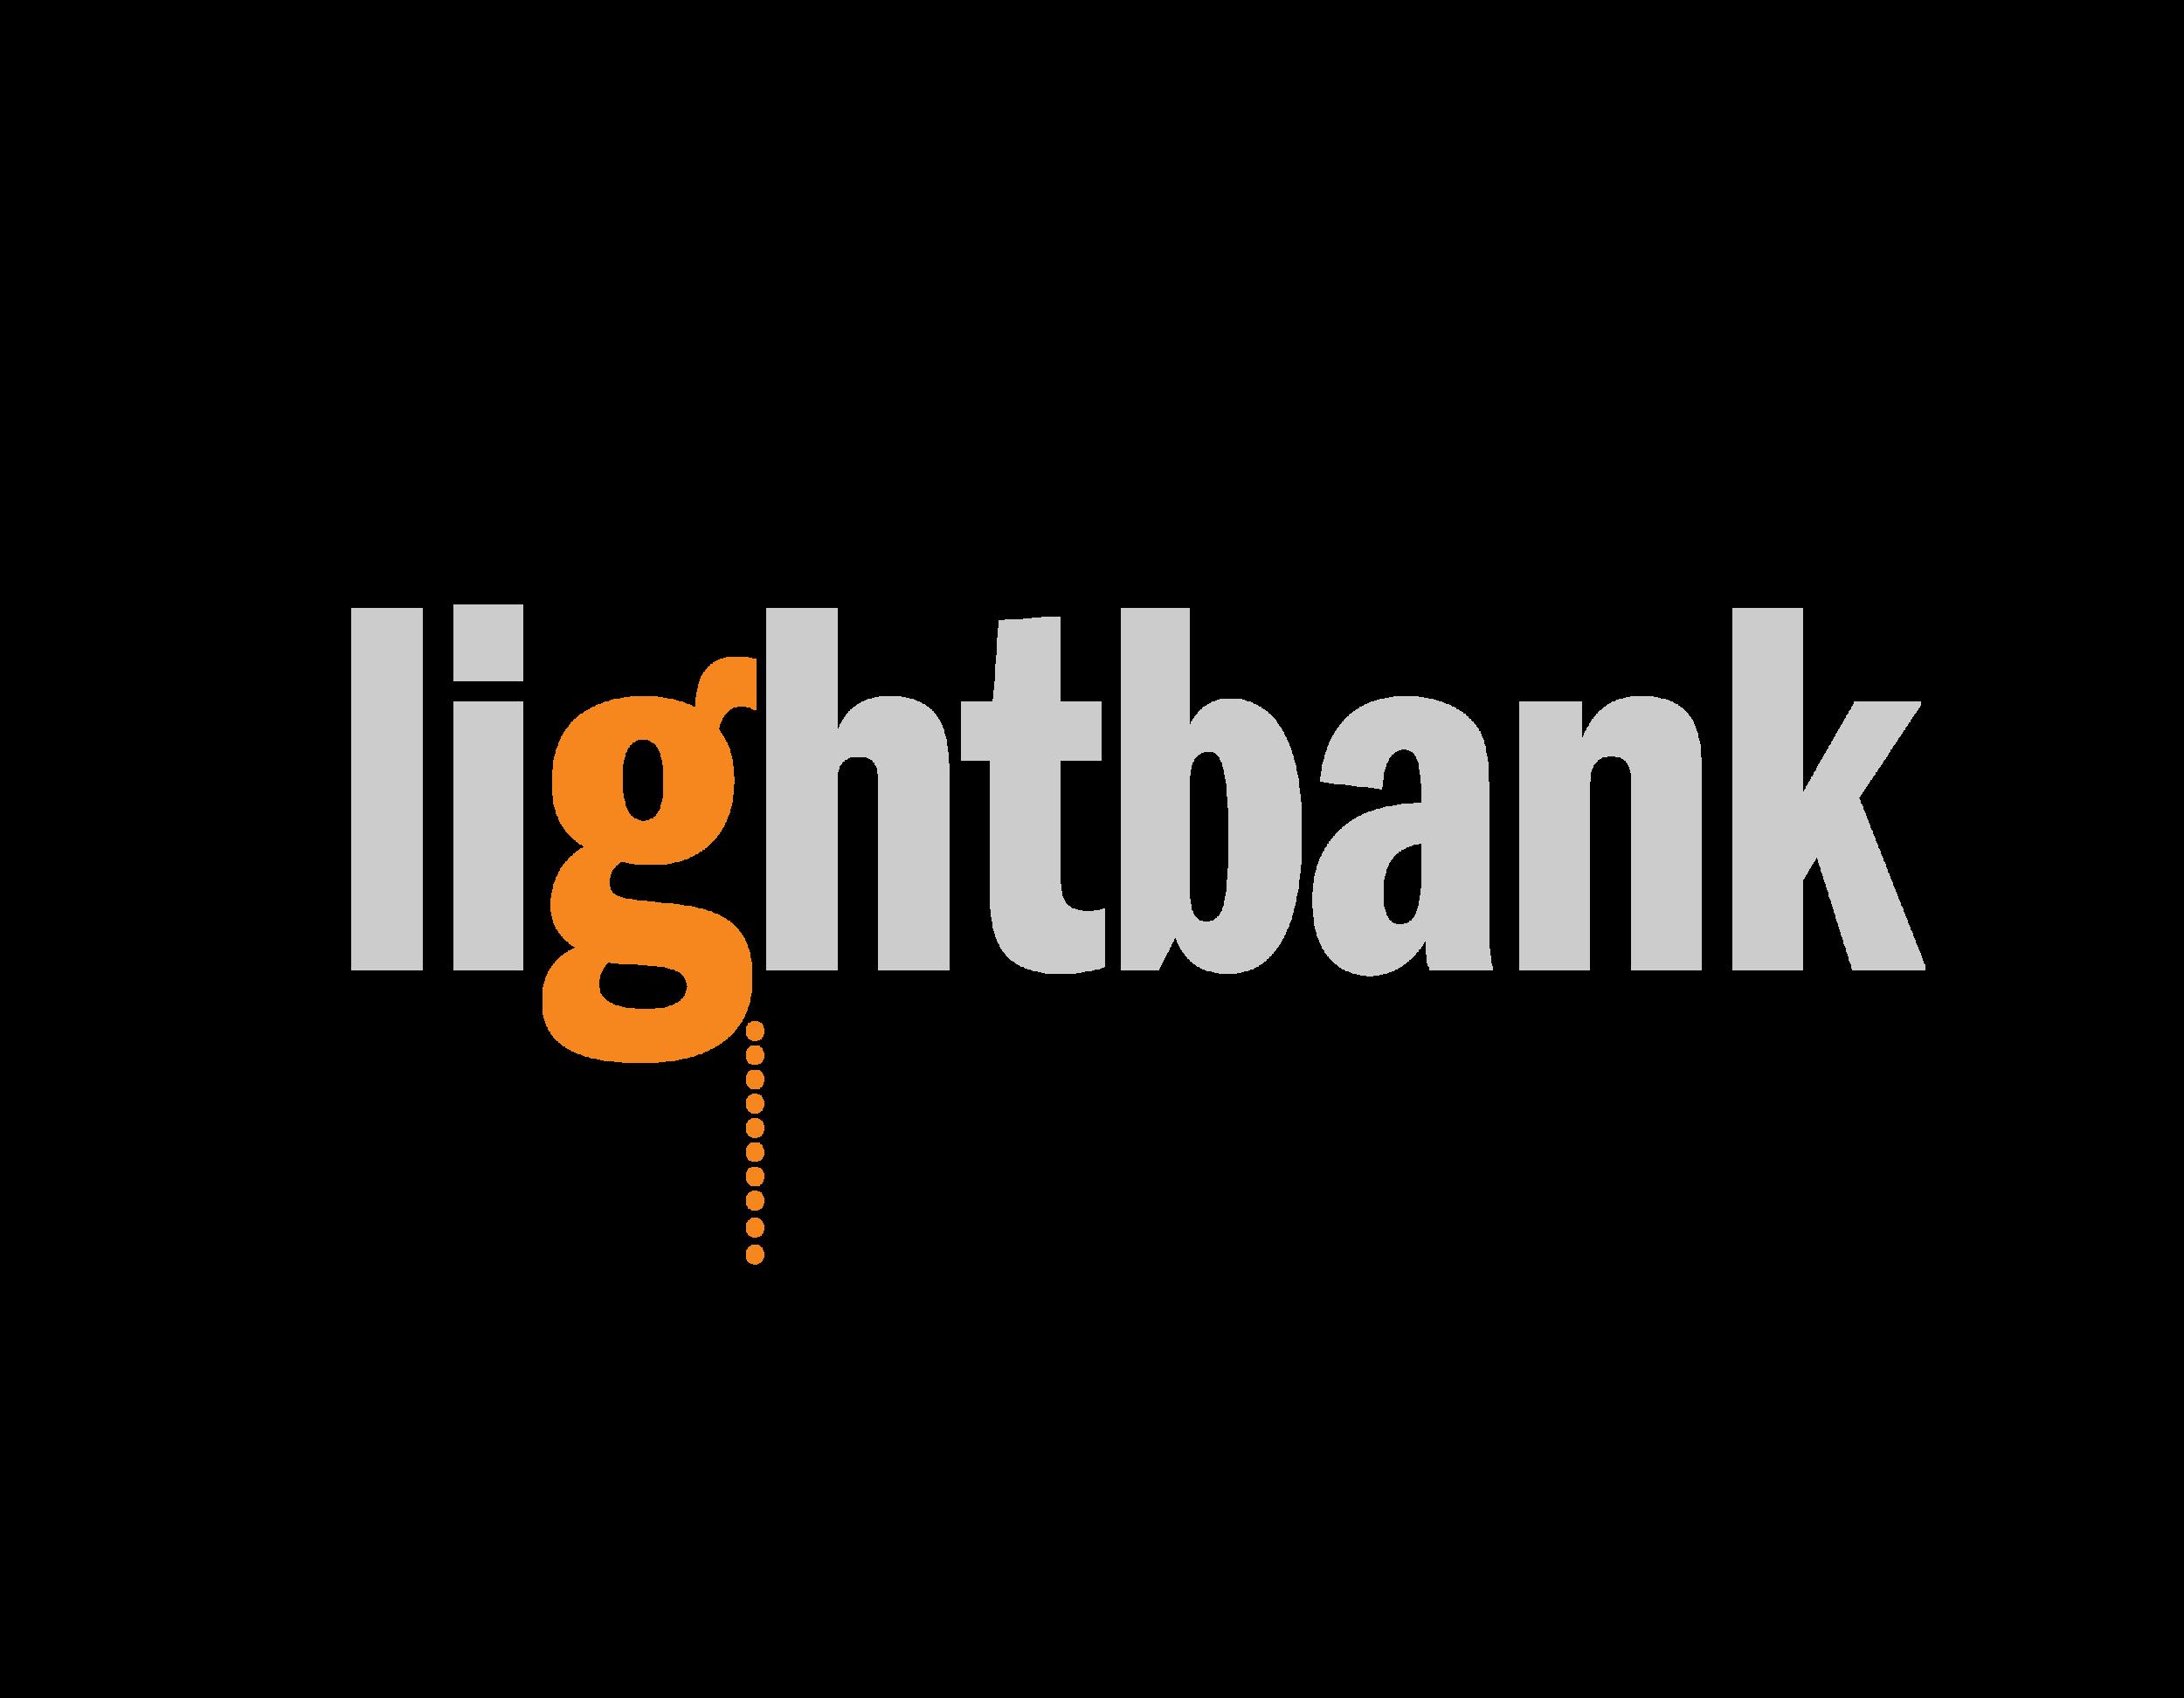 lightbank.png